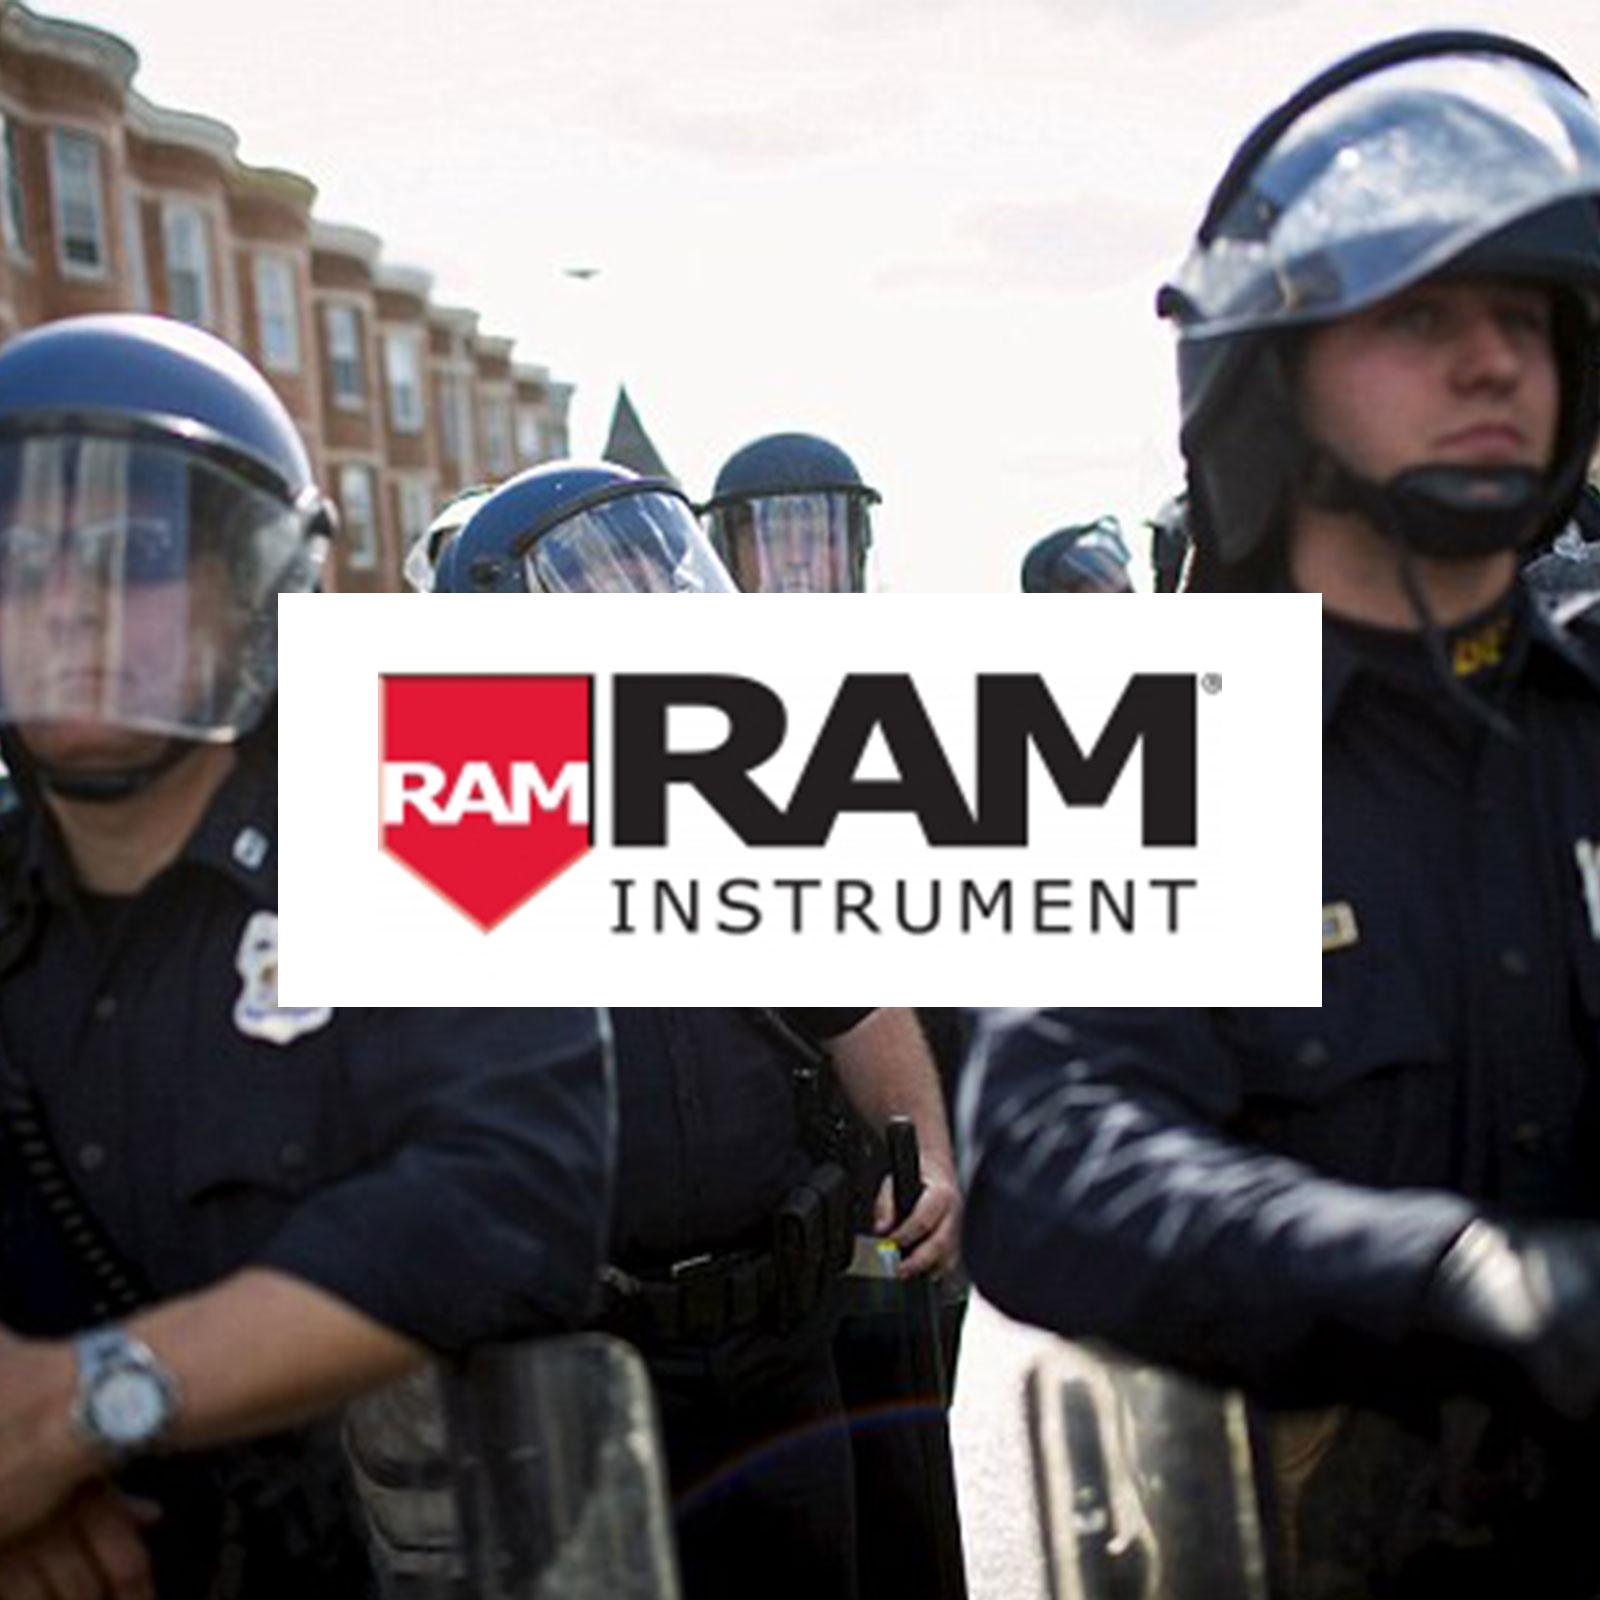 RAM Instrument